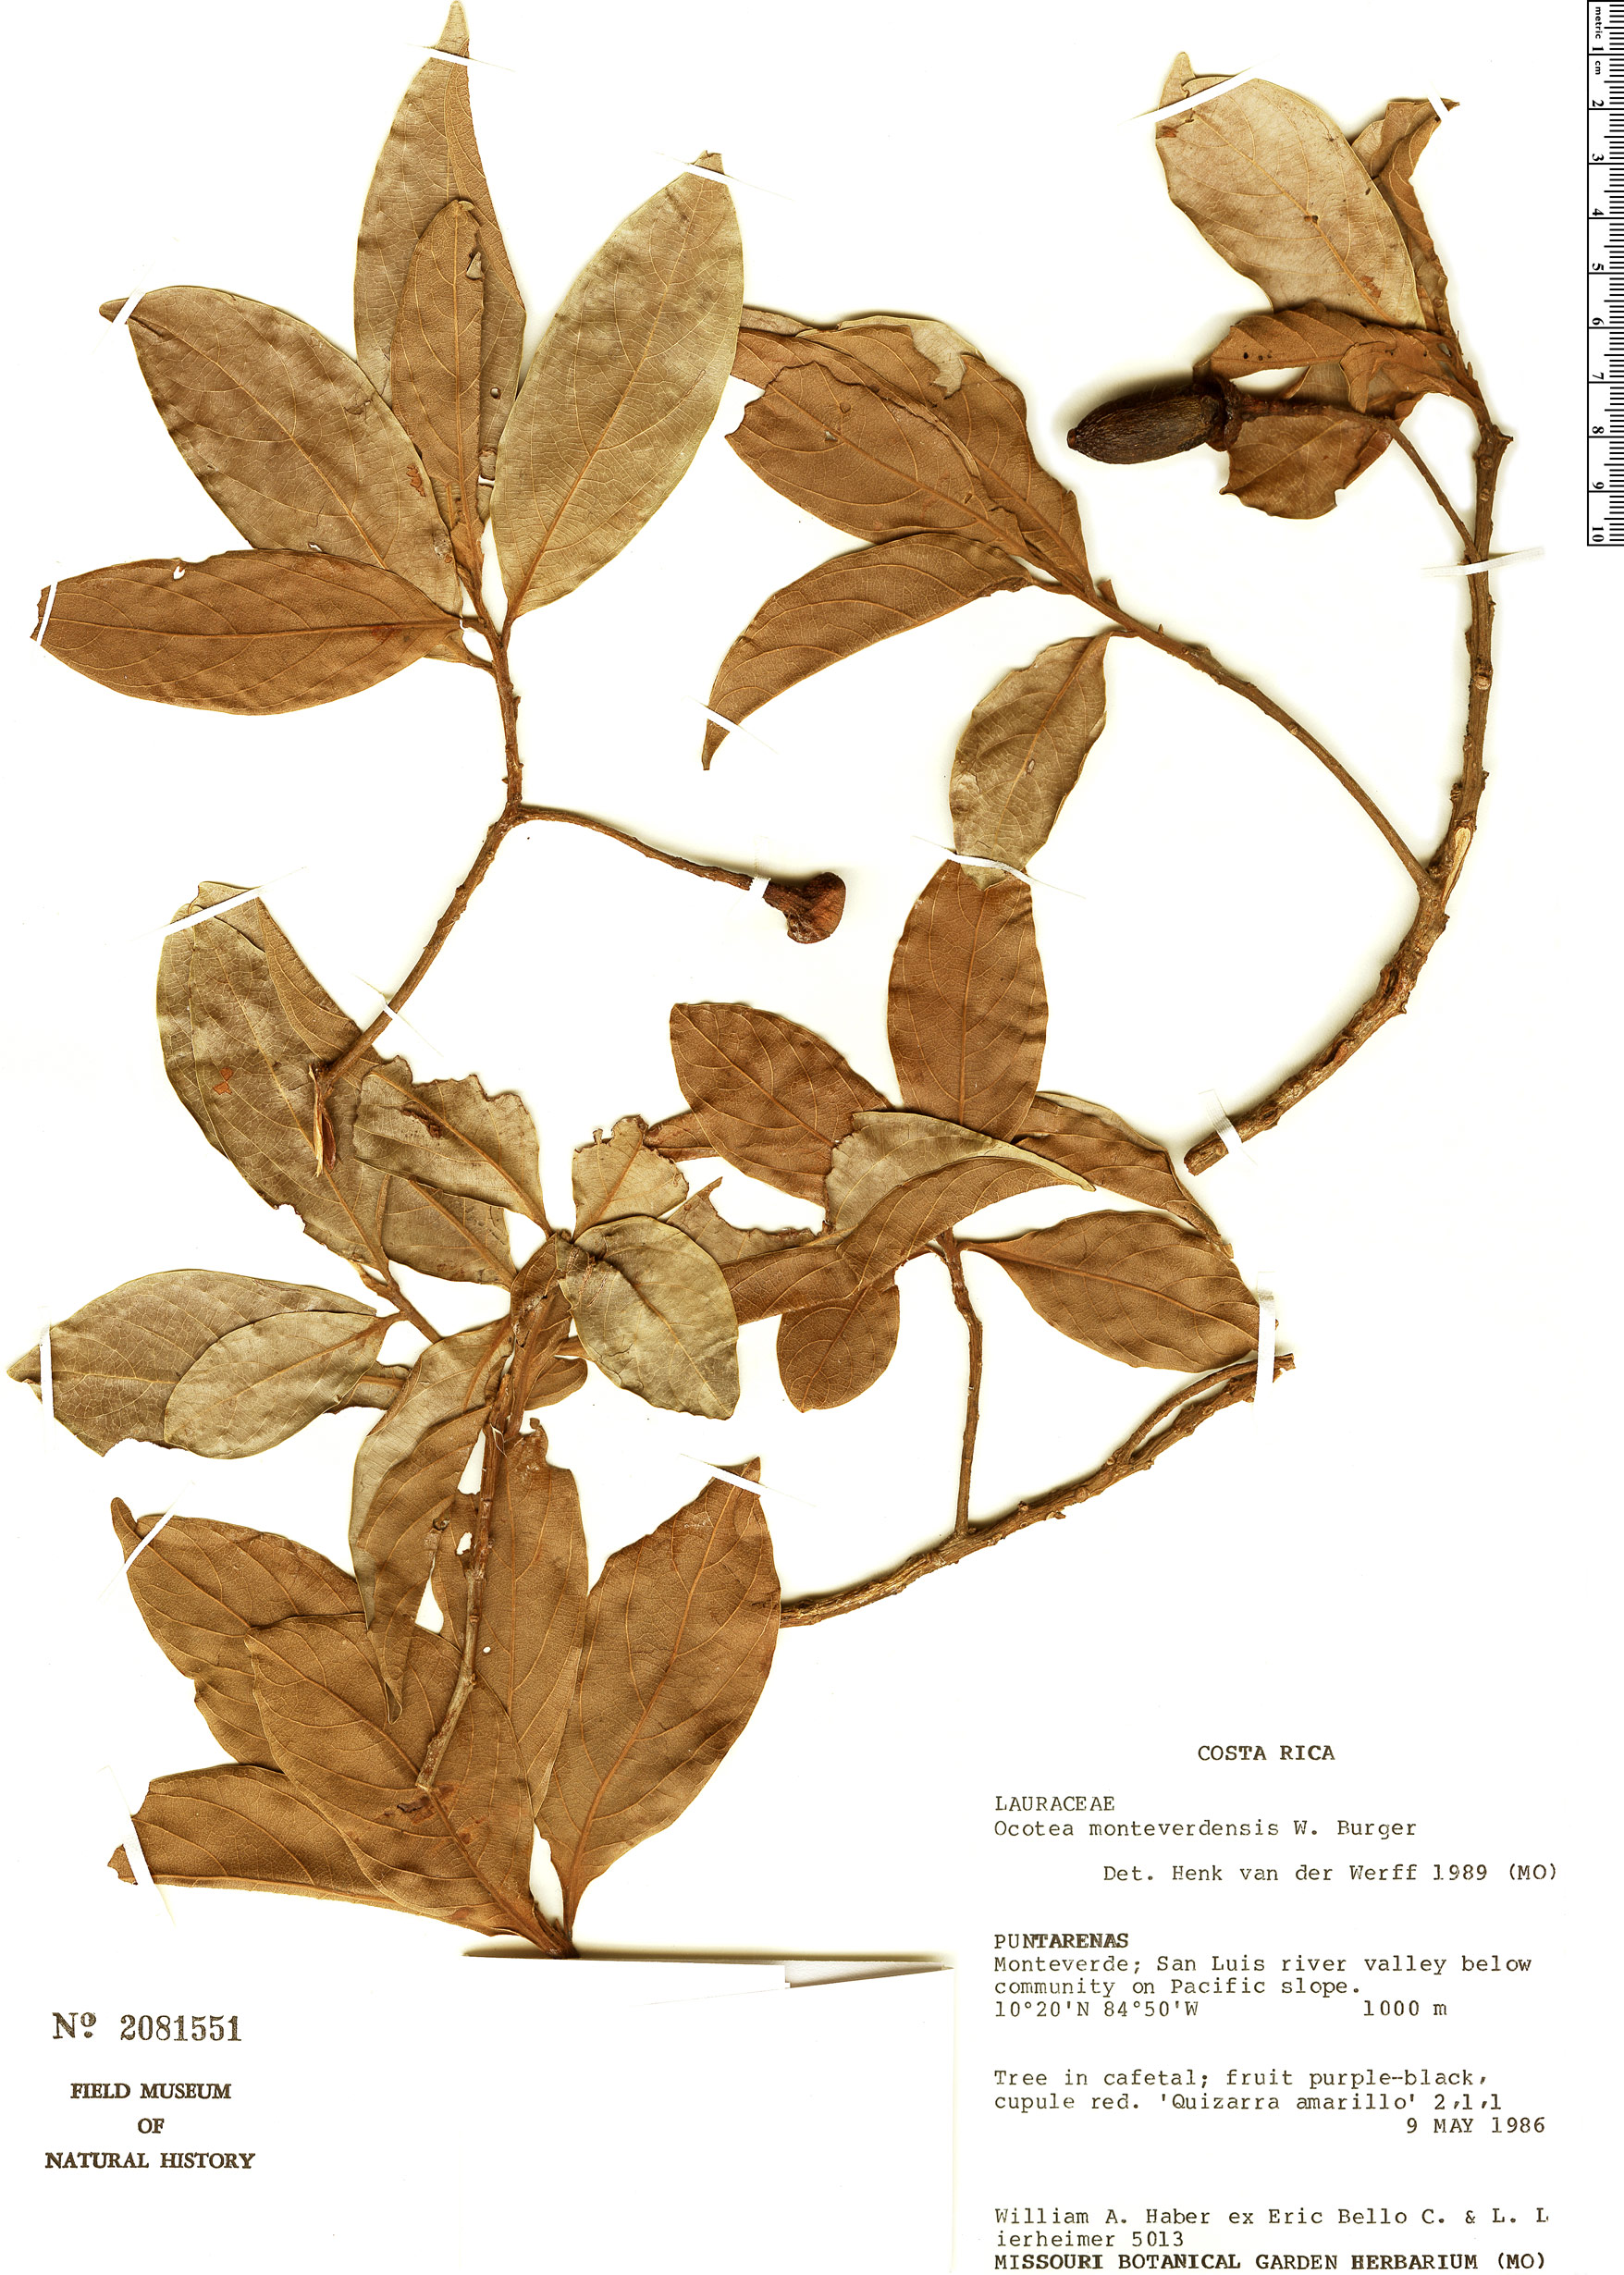 Specimen: Ocotea monteverdensis